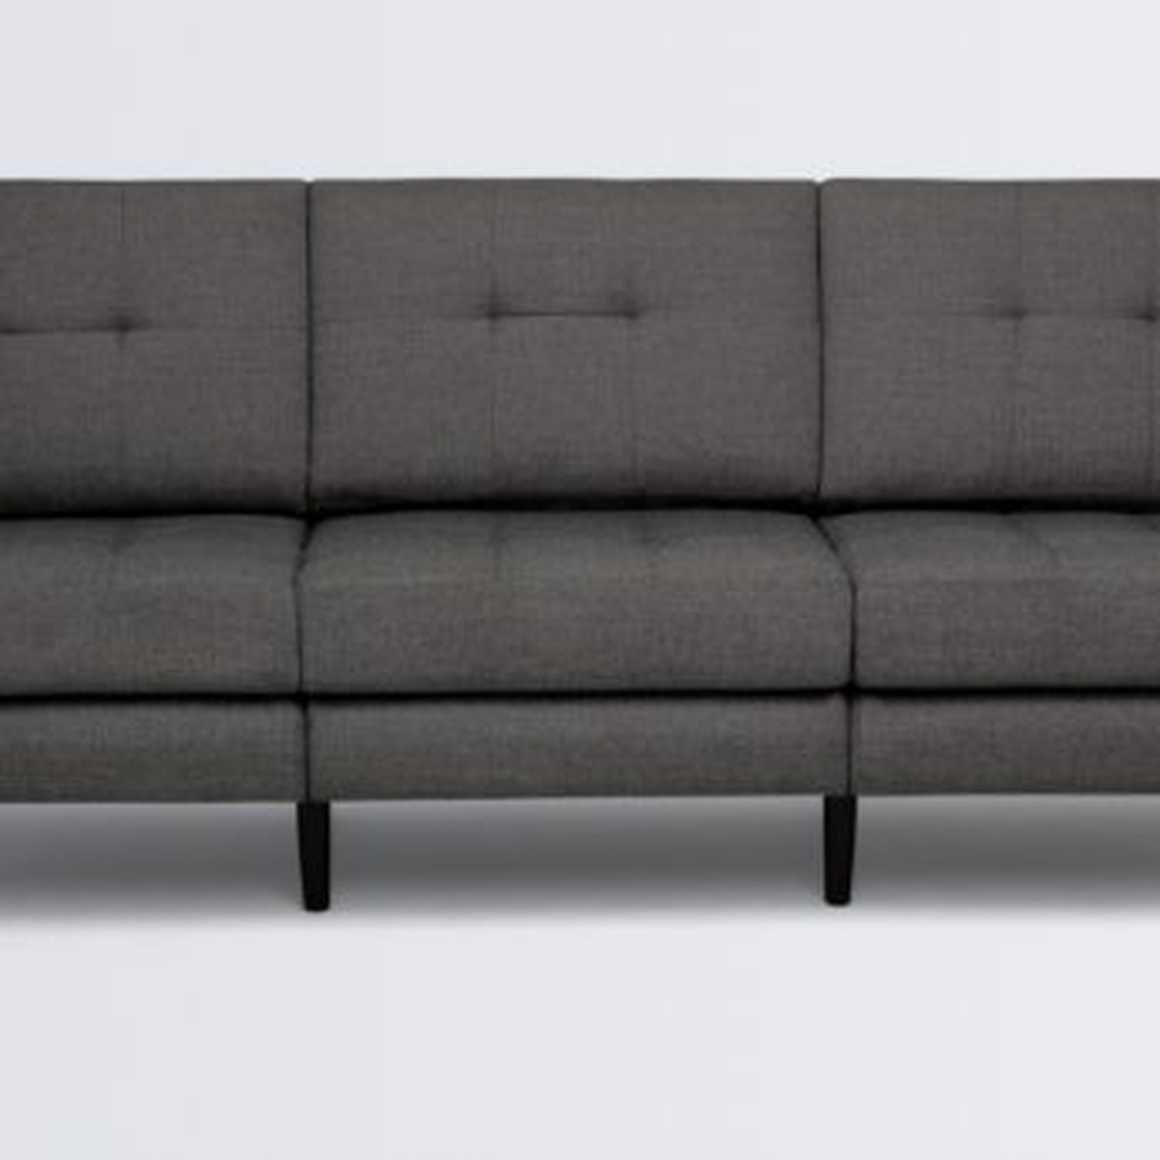 Terrific The Burrow Sofa Charcoal 3 Seats Low Arm Walnut Legs Machost Co Dining Chair Design Ideas Machostcouk